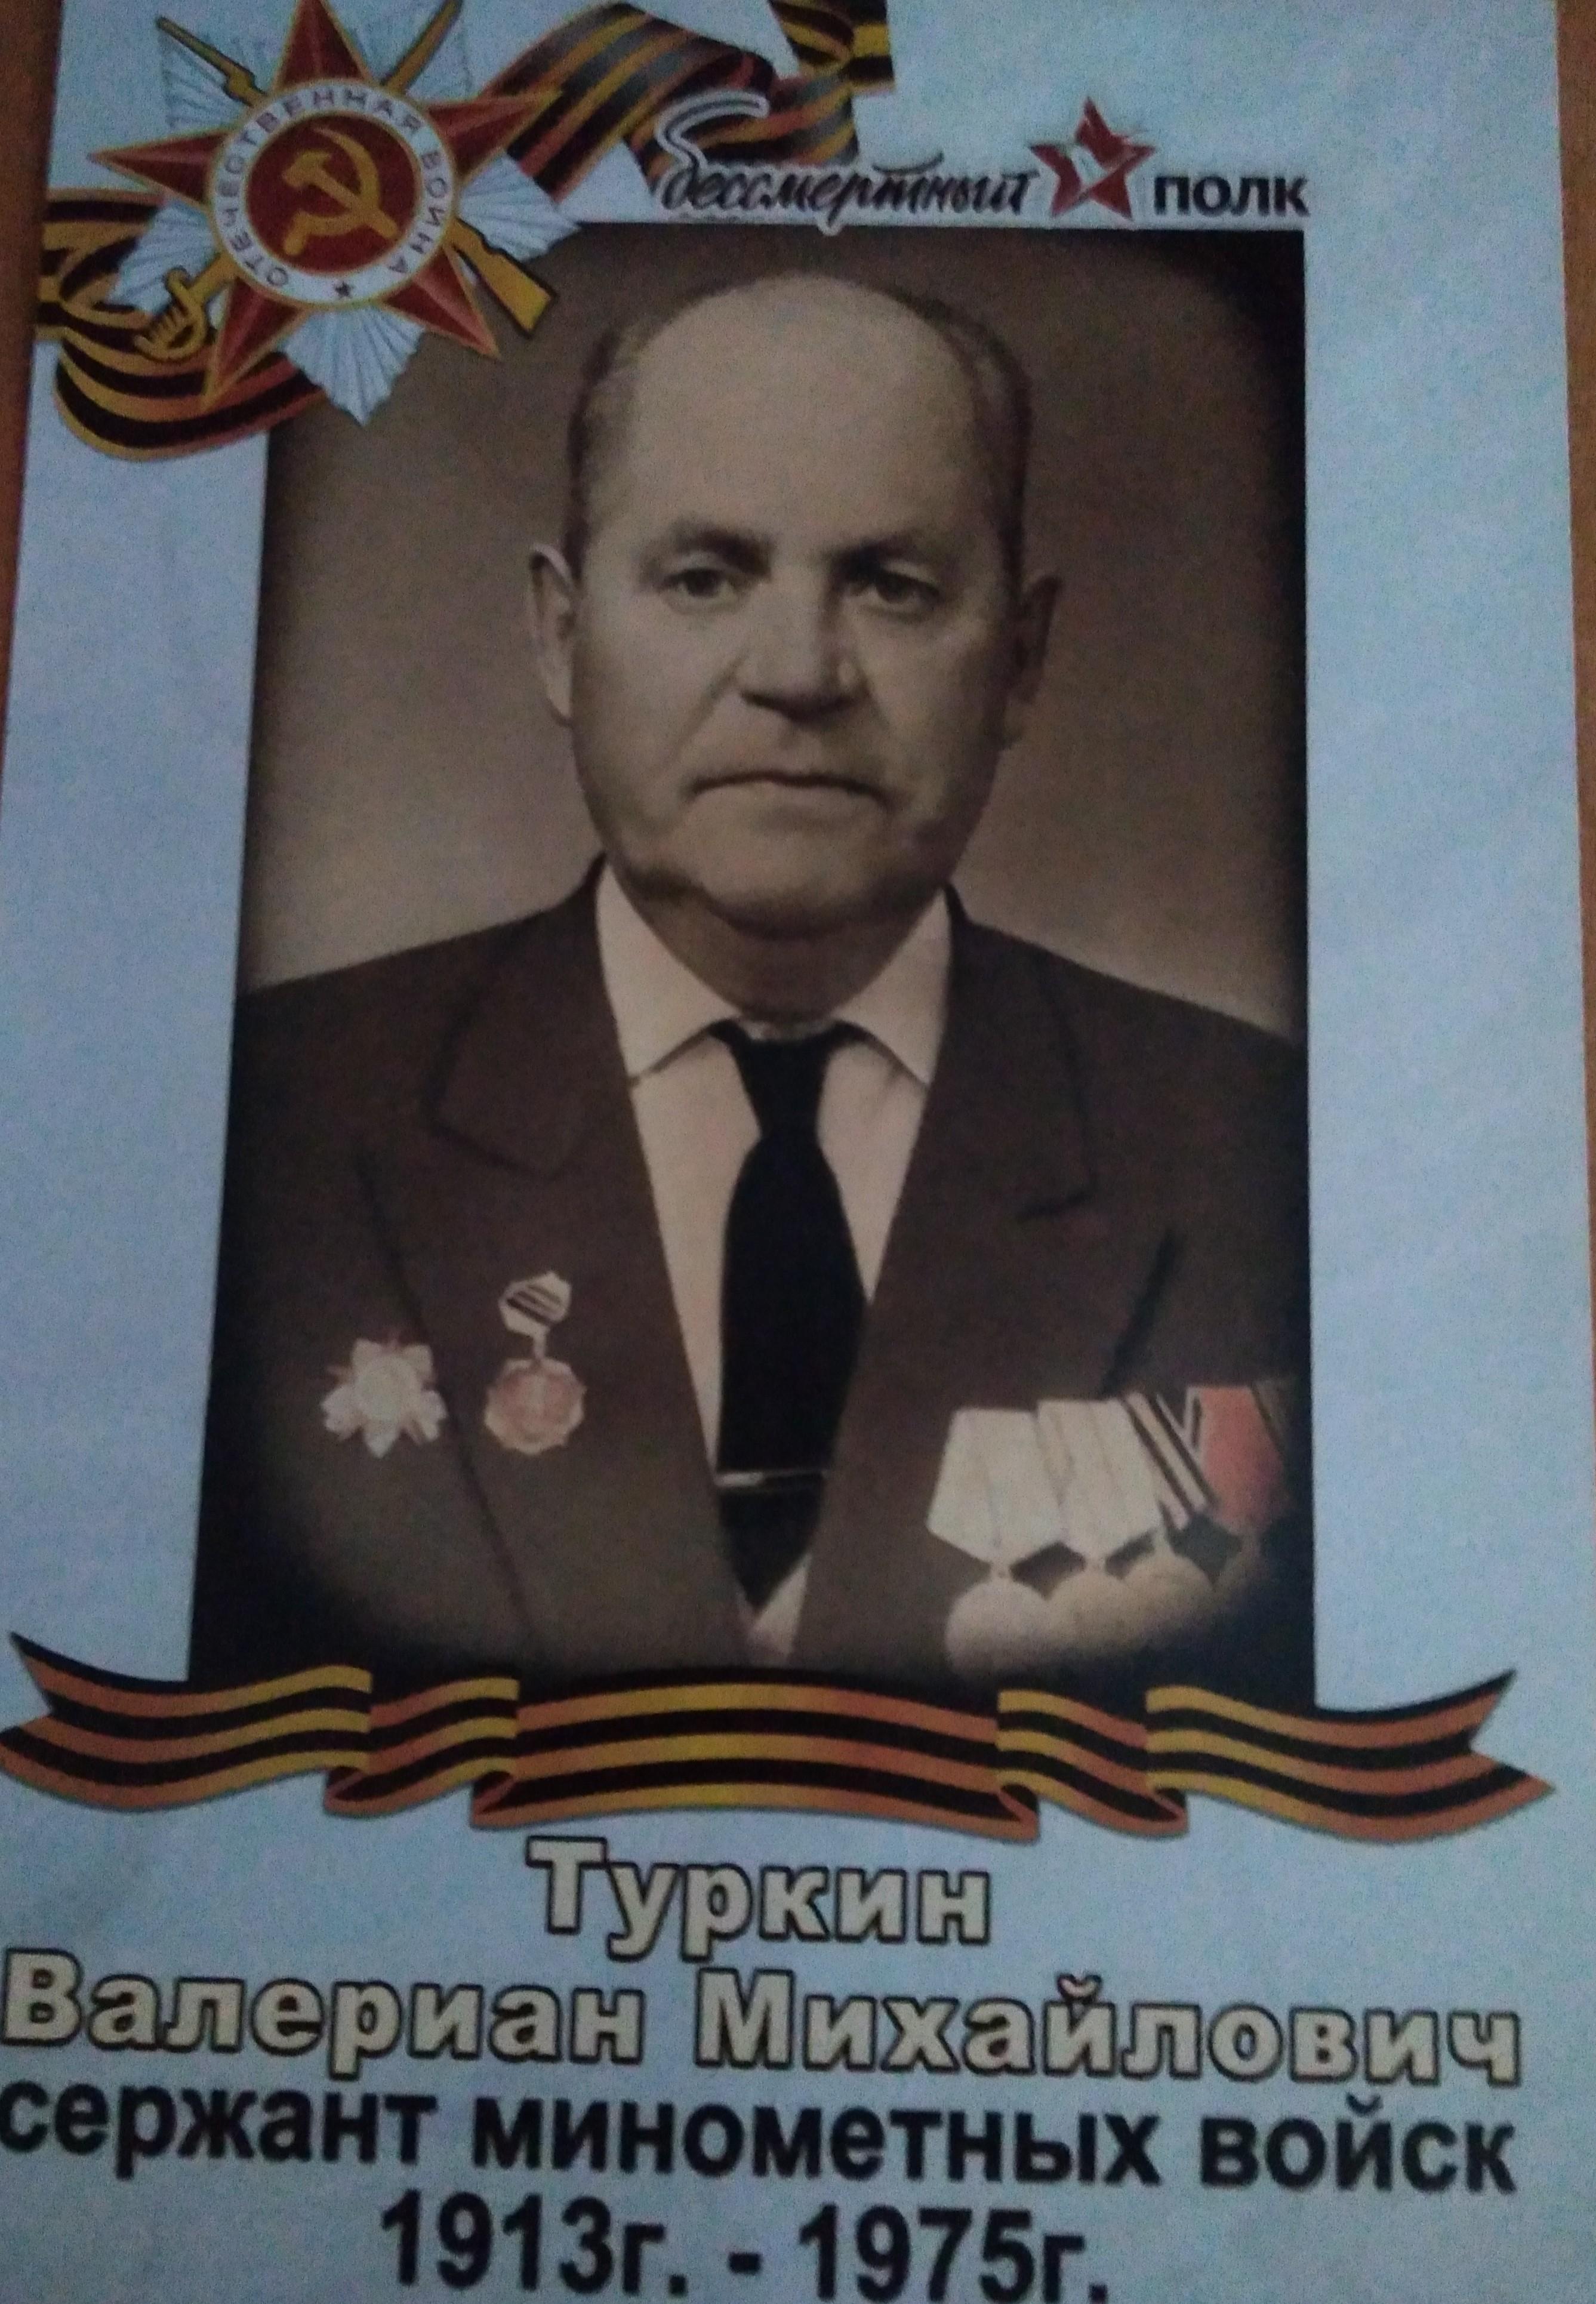 http://vrnschool85.ucoz.ru/111/P_20200506_161652_1.jpg